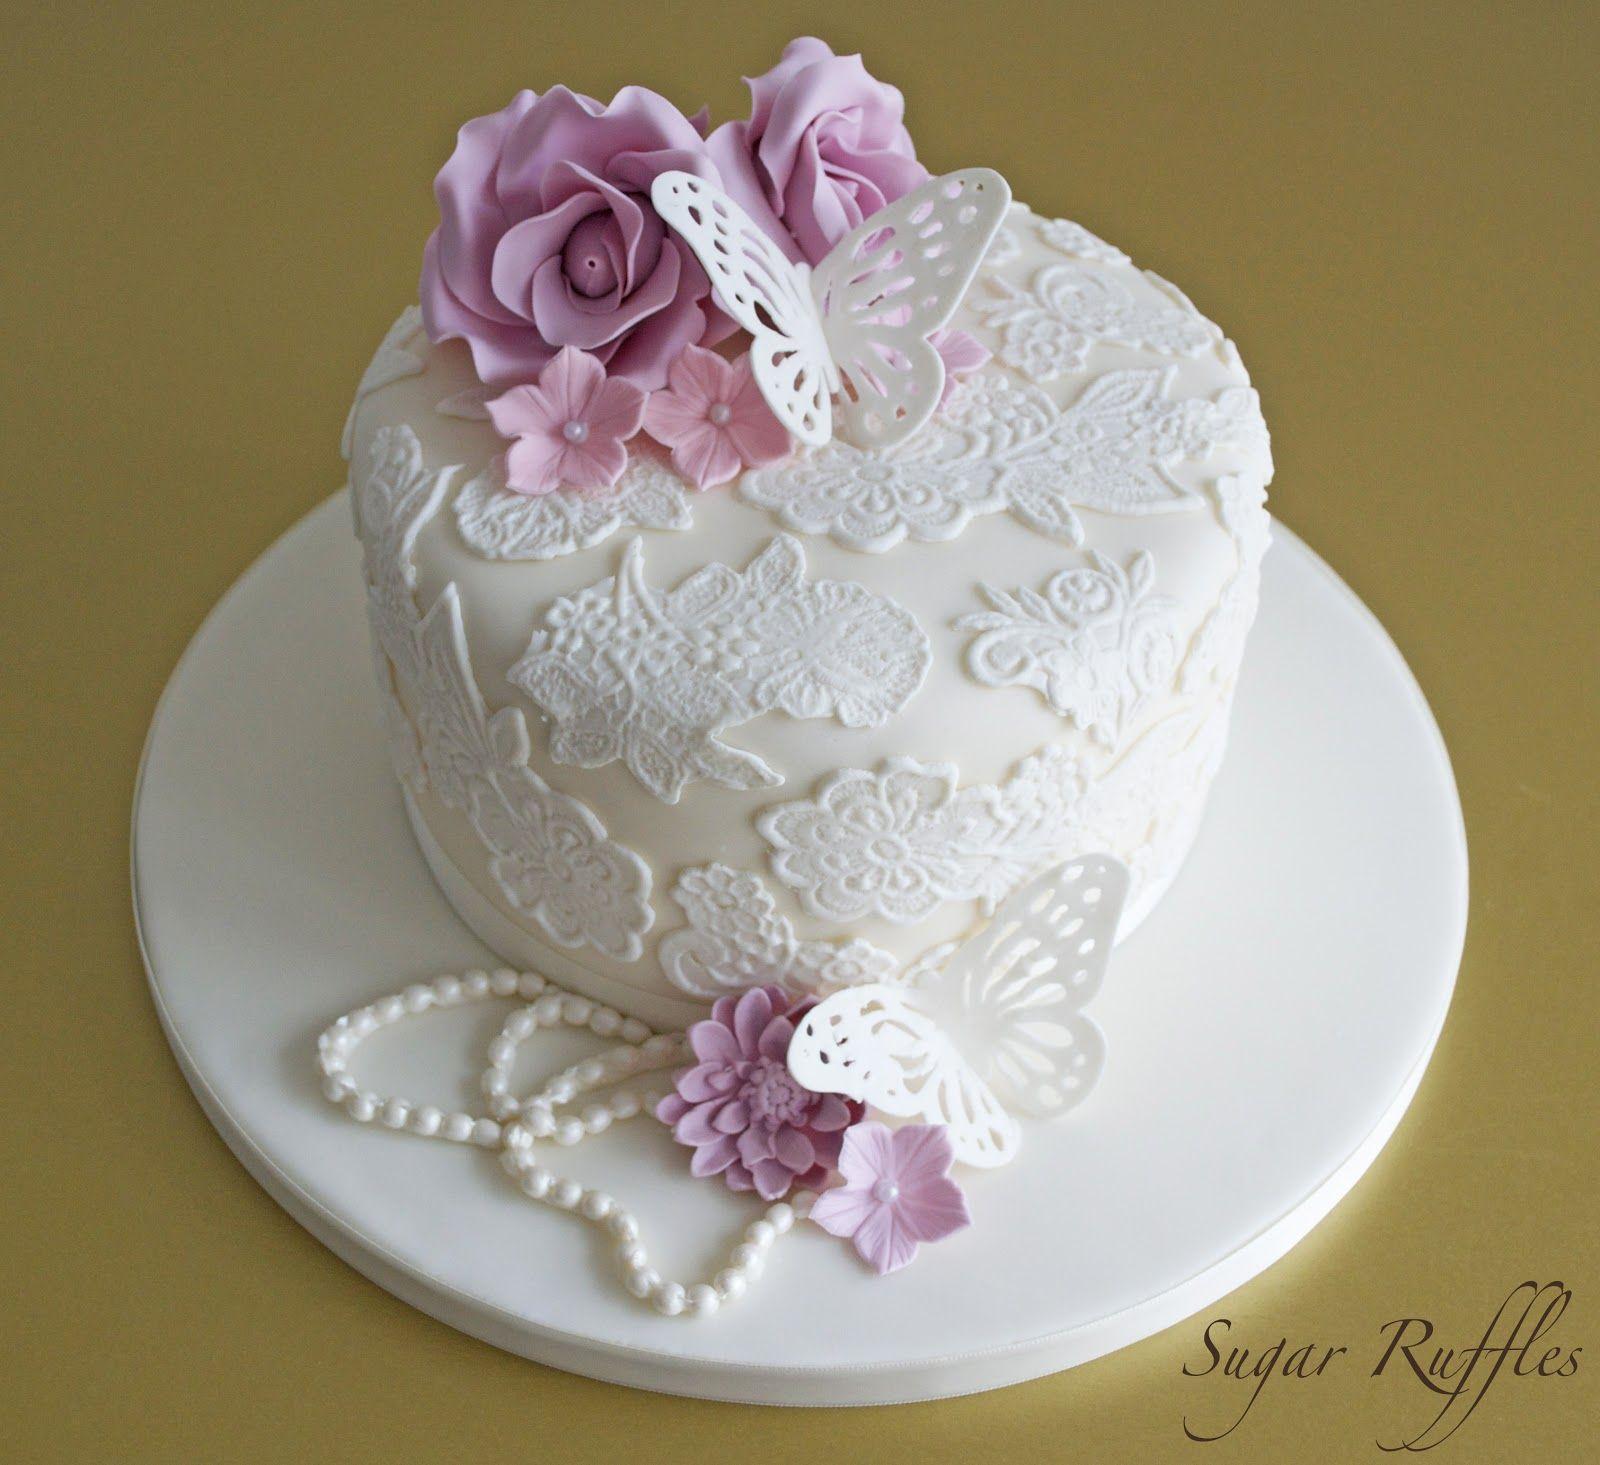 Mum S Seventieth Birthday Cake Fondant Roses And Cake Lace The